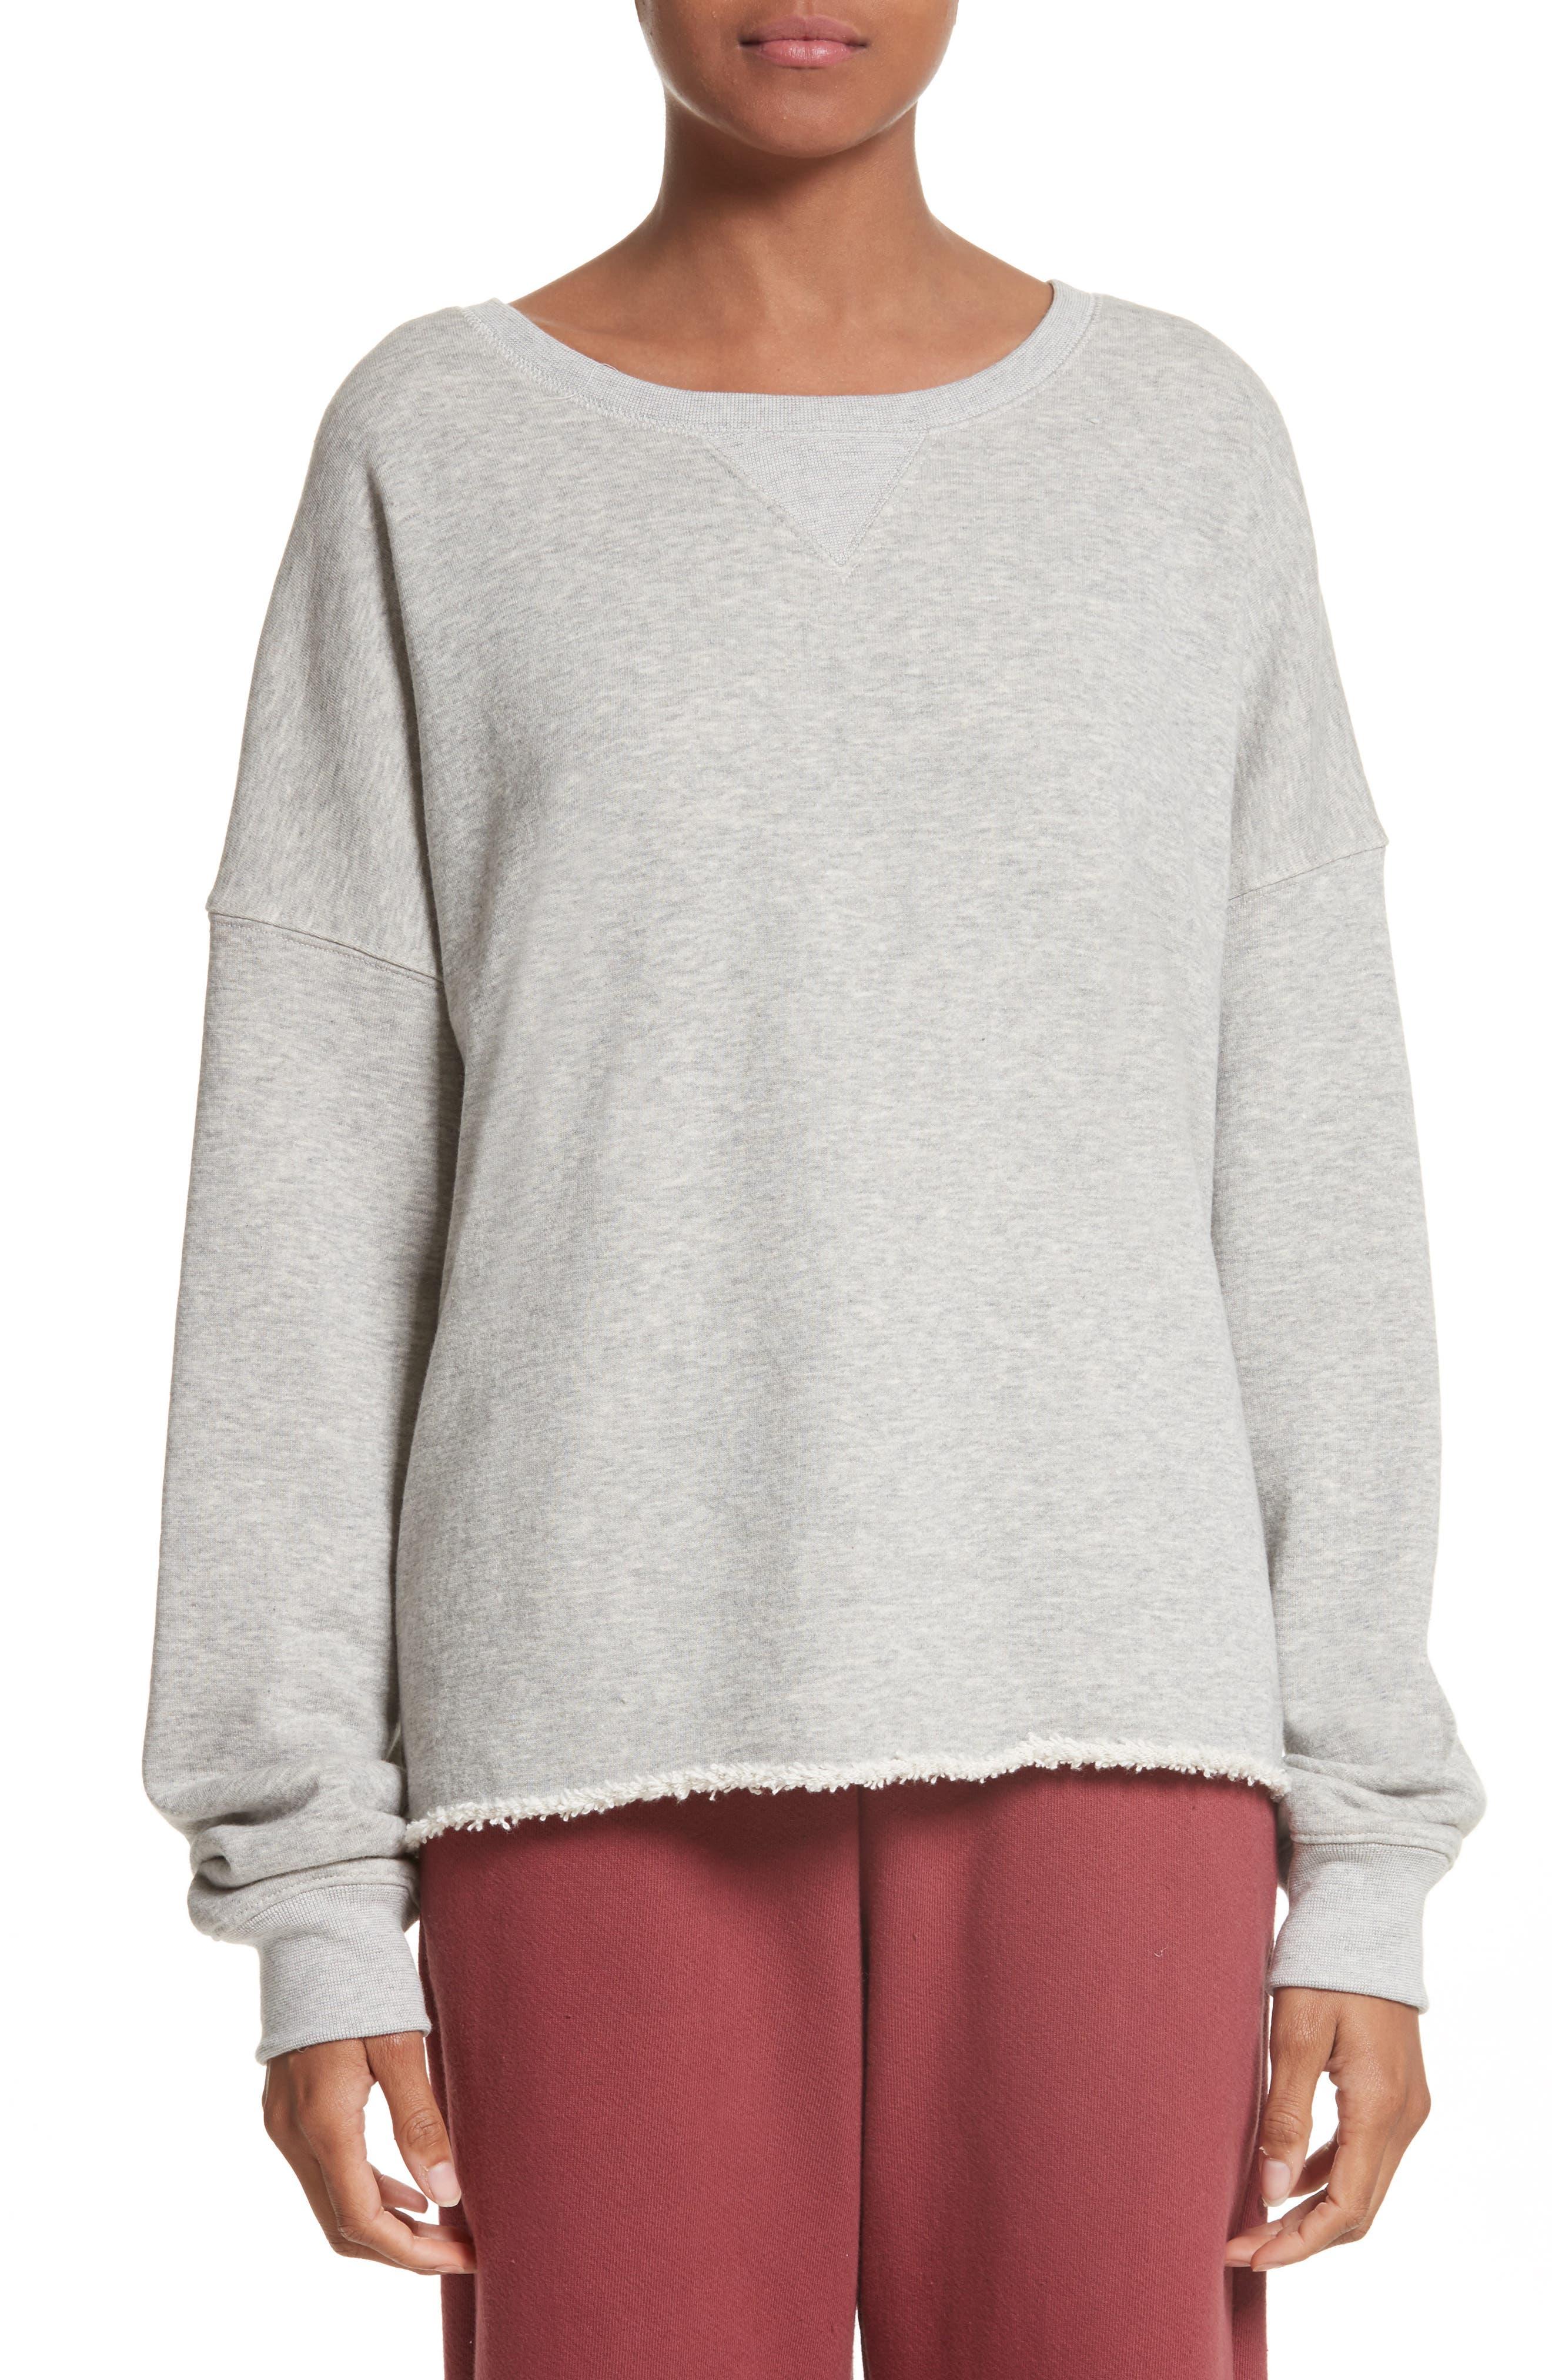 Brushed Terry Sweatshirt,                         Main,                         color, Grey